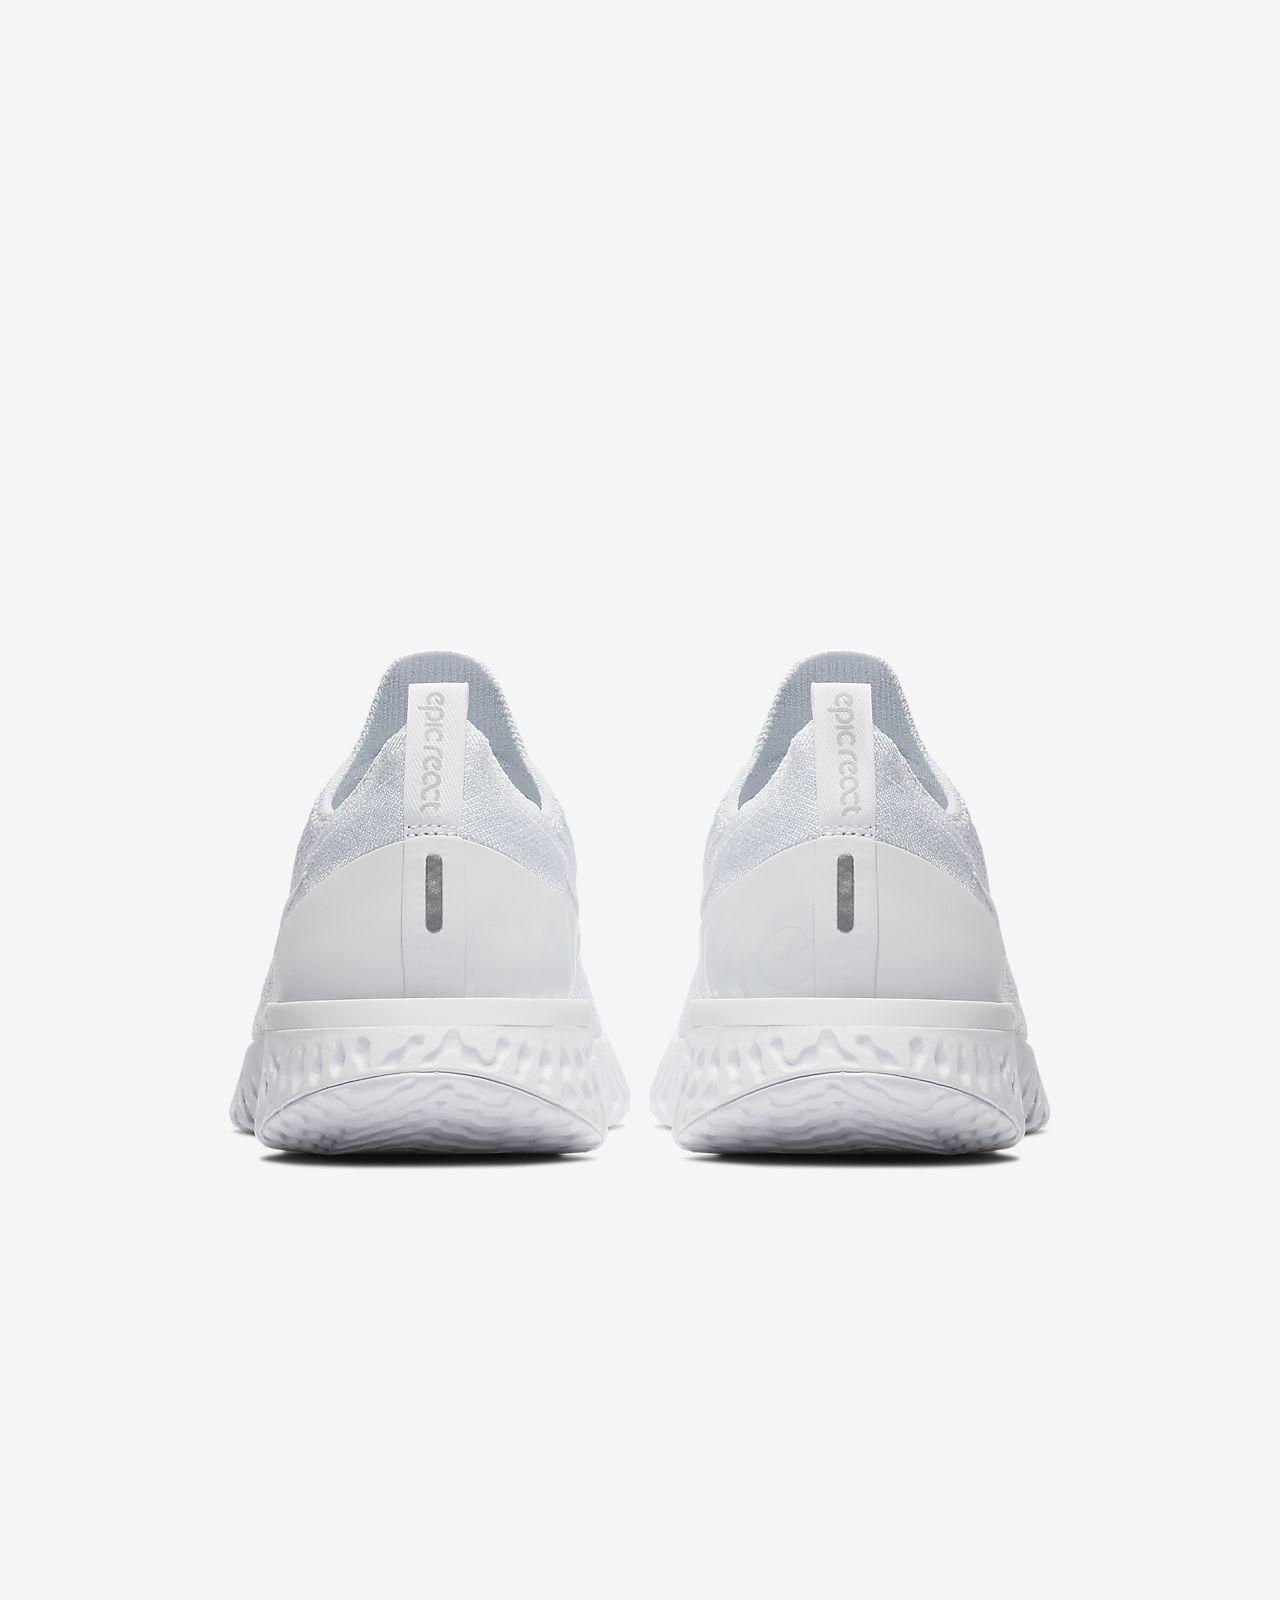 online store 862d7 5e118 ... Nike Epic React Flyknit Men s Running Shoe